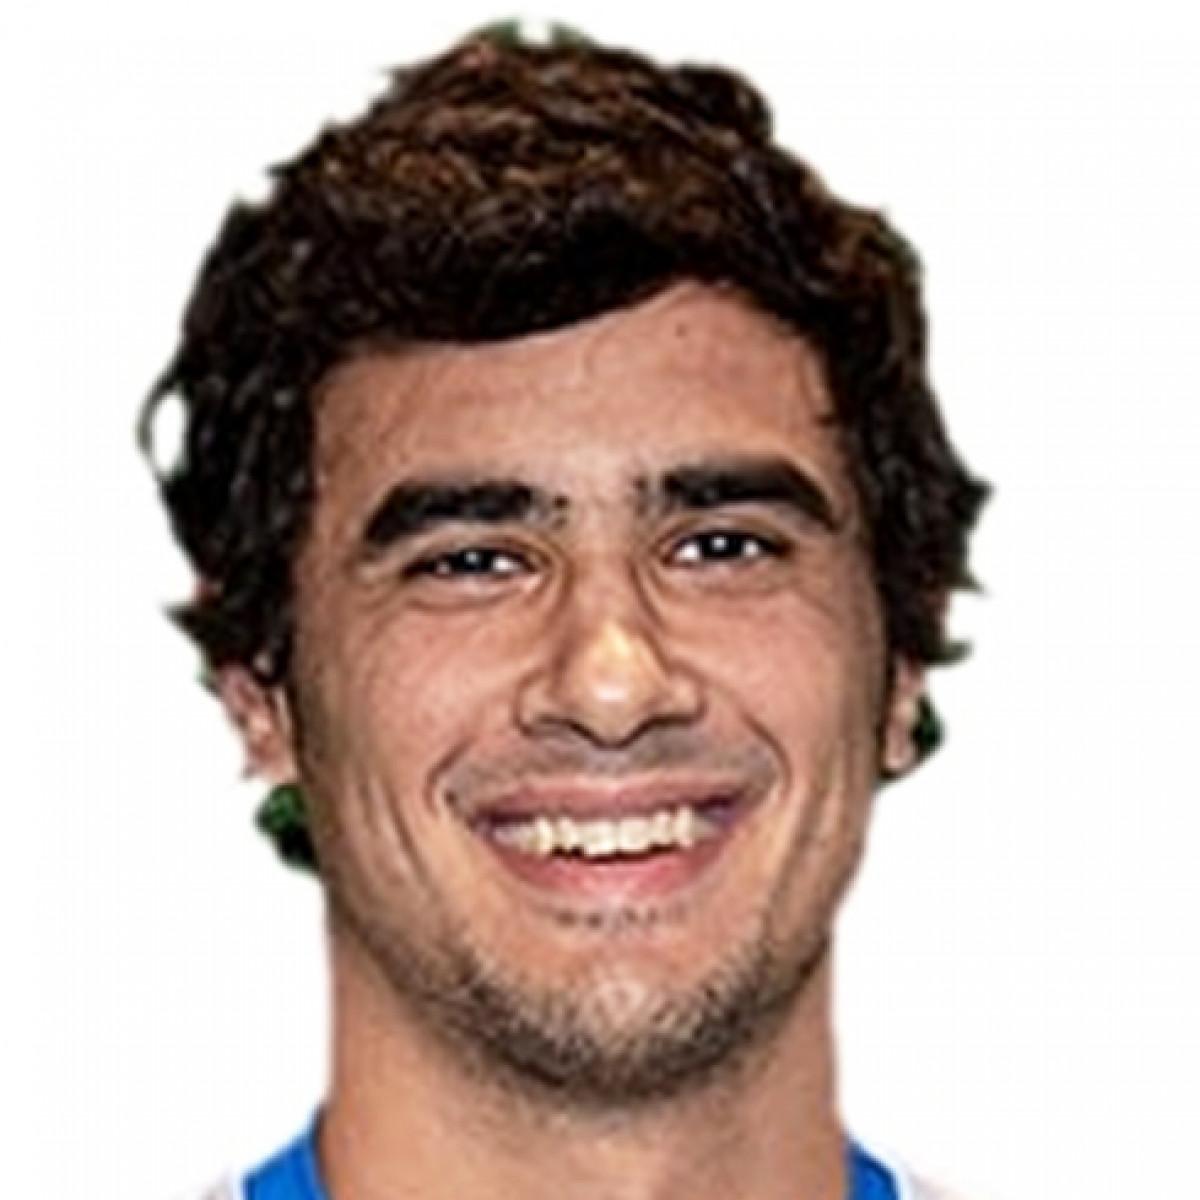 Matteo Lagana